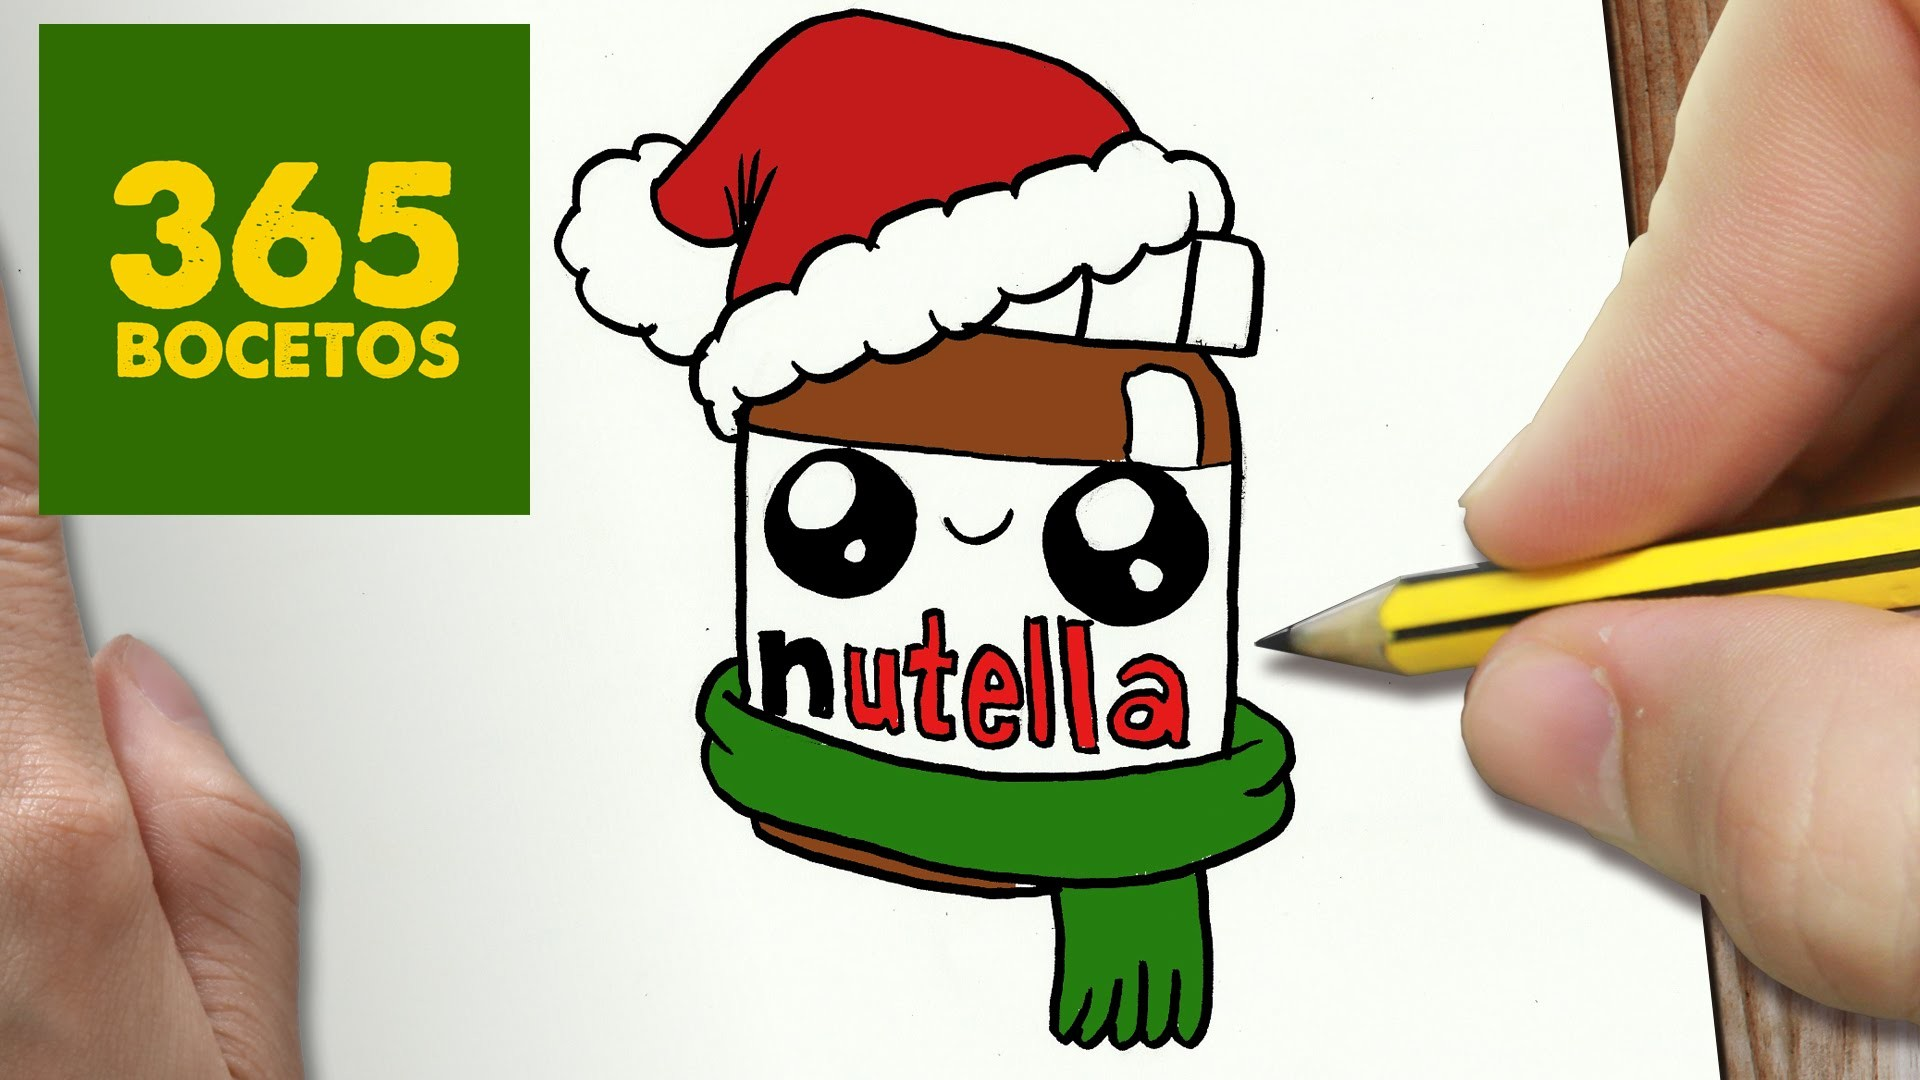 COMO DIBUJAR UN NUTELLA PARA NAVIDAD PASO A PASO: Dibujos kawaii navideños - How to draw a nutella